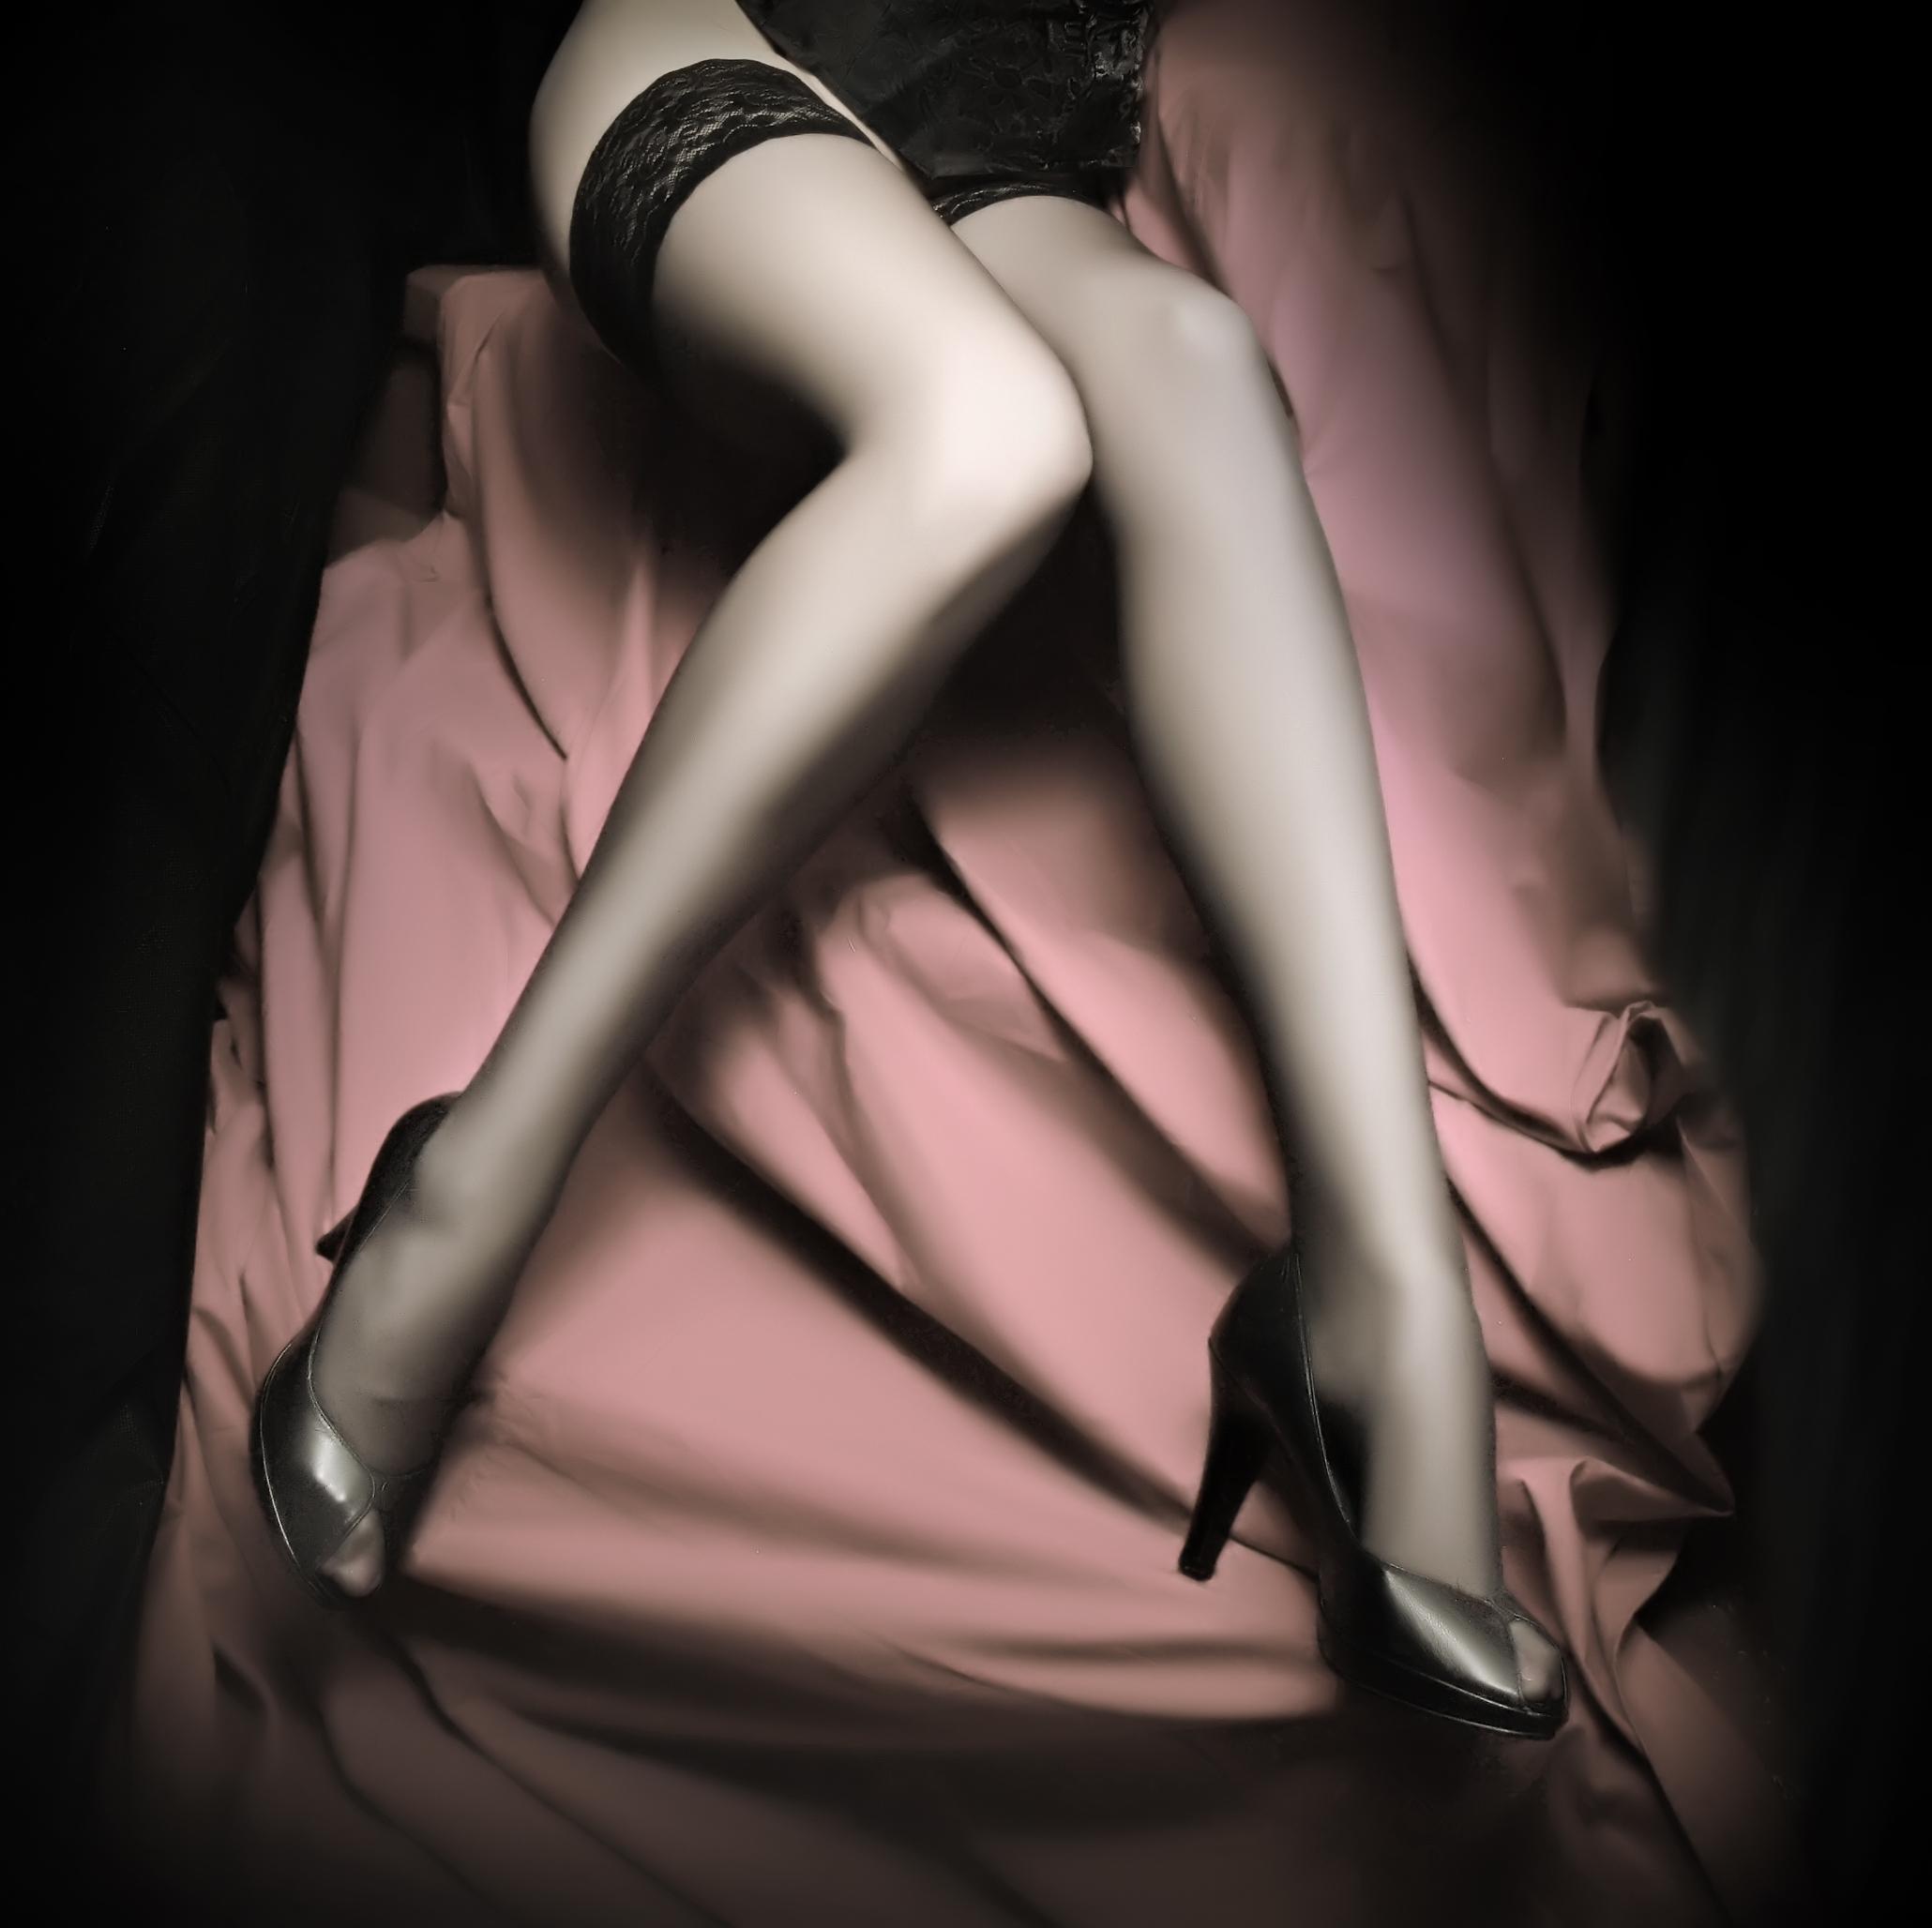 womans-legs-with-black-hose.jpg